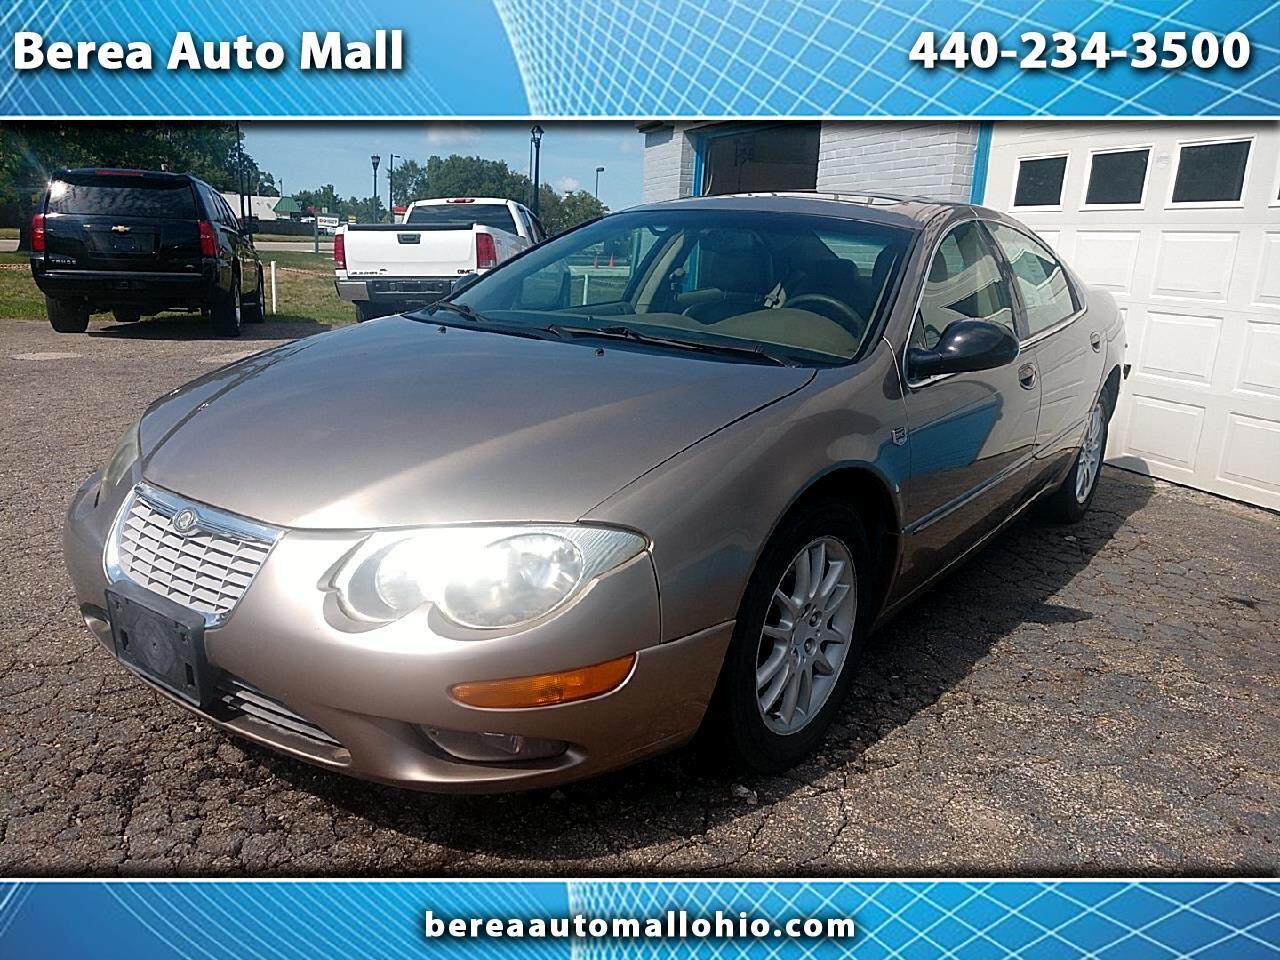 2002 Chrysler 300M 4dr Sdn